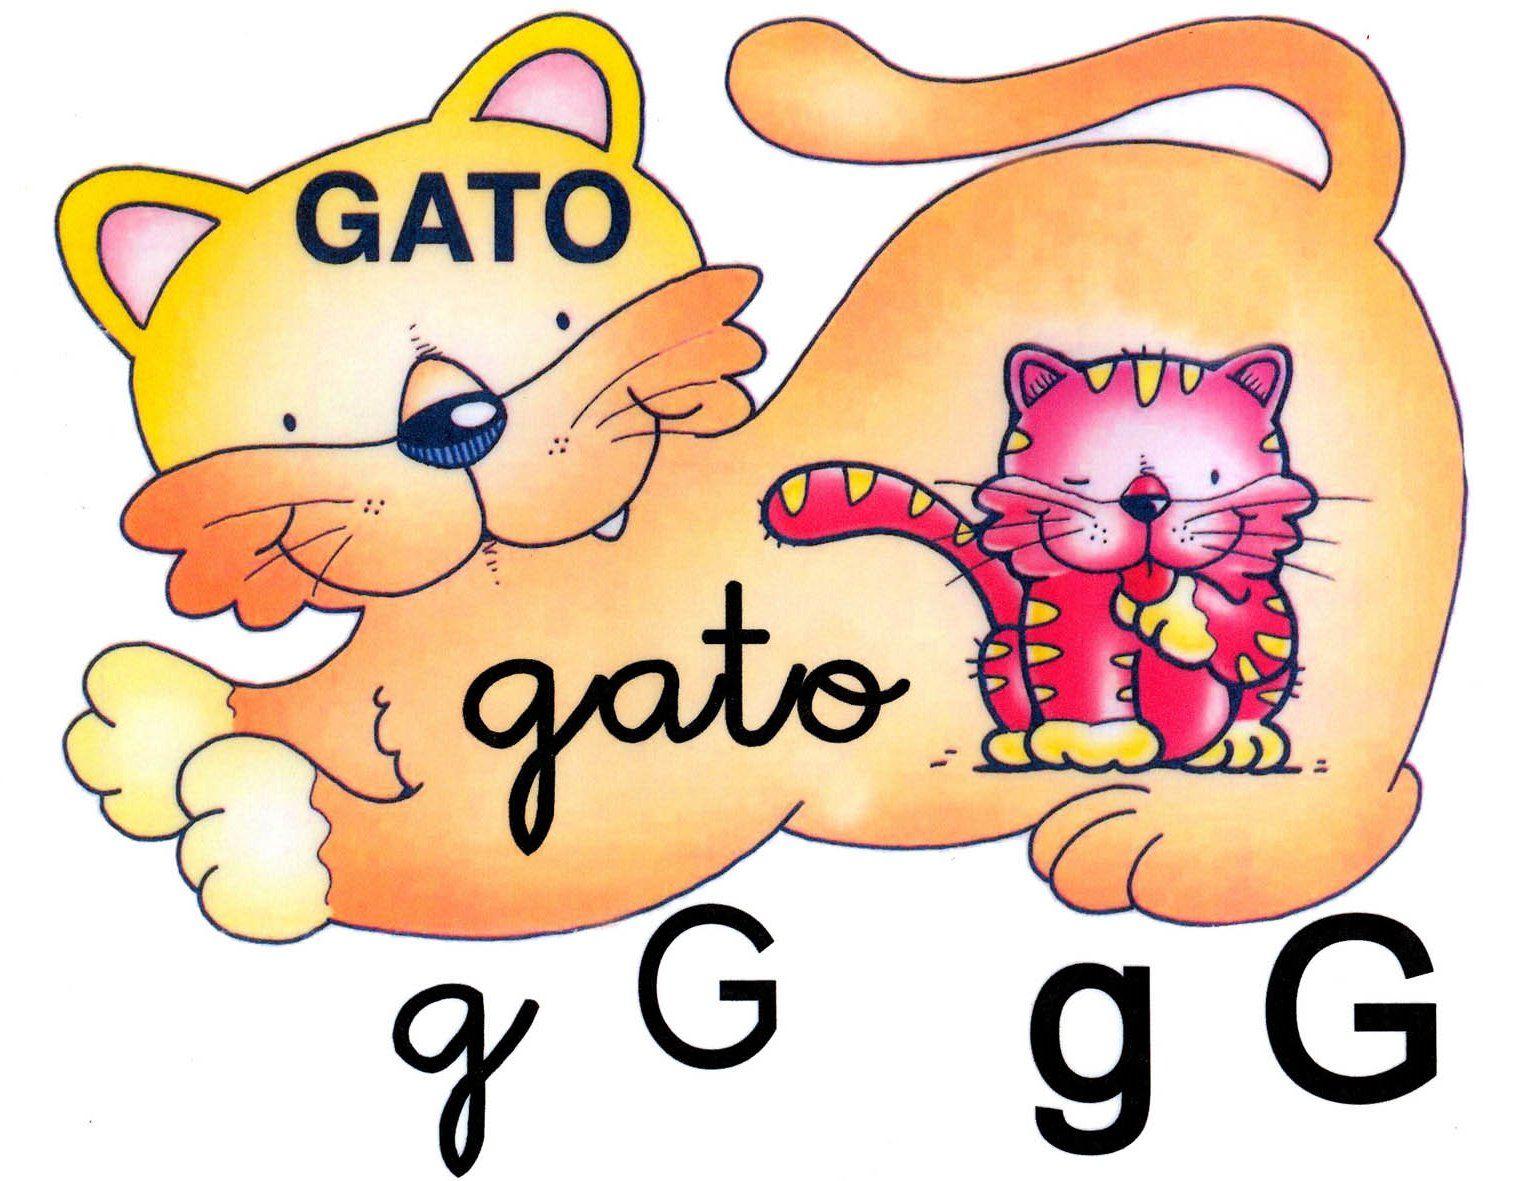 Letra g minúscula, G mayúscula. Gato. | Education | Pinterest ...